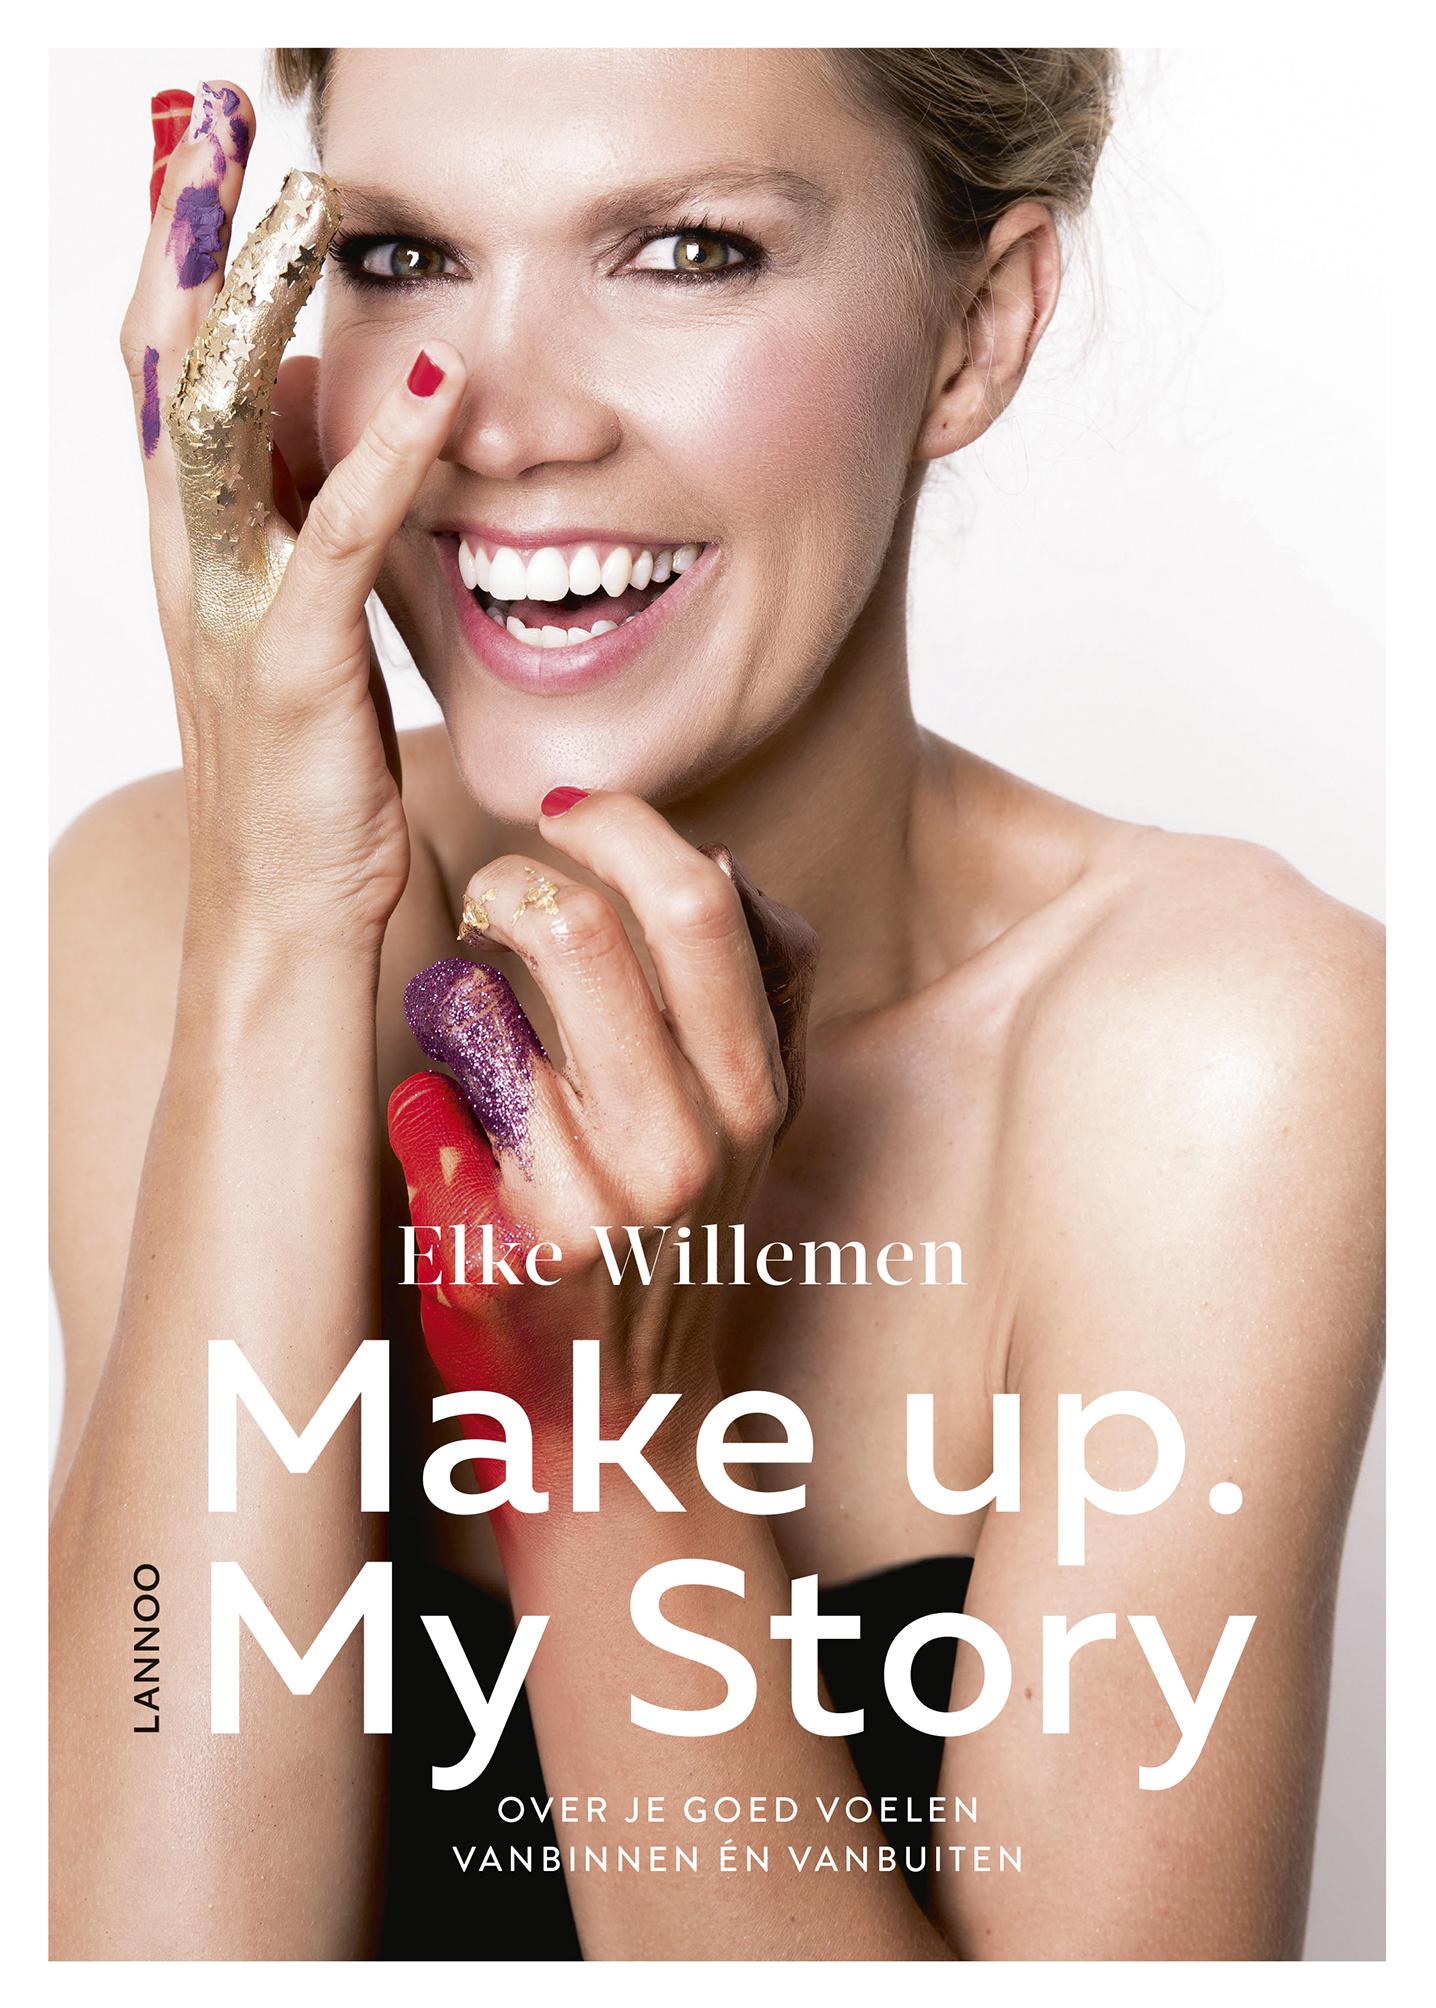 makeupmystory